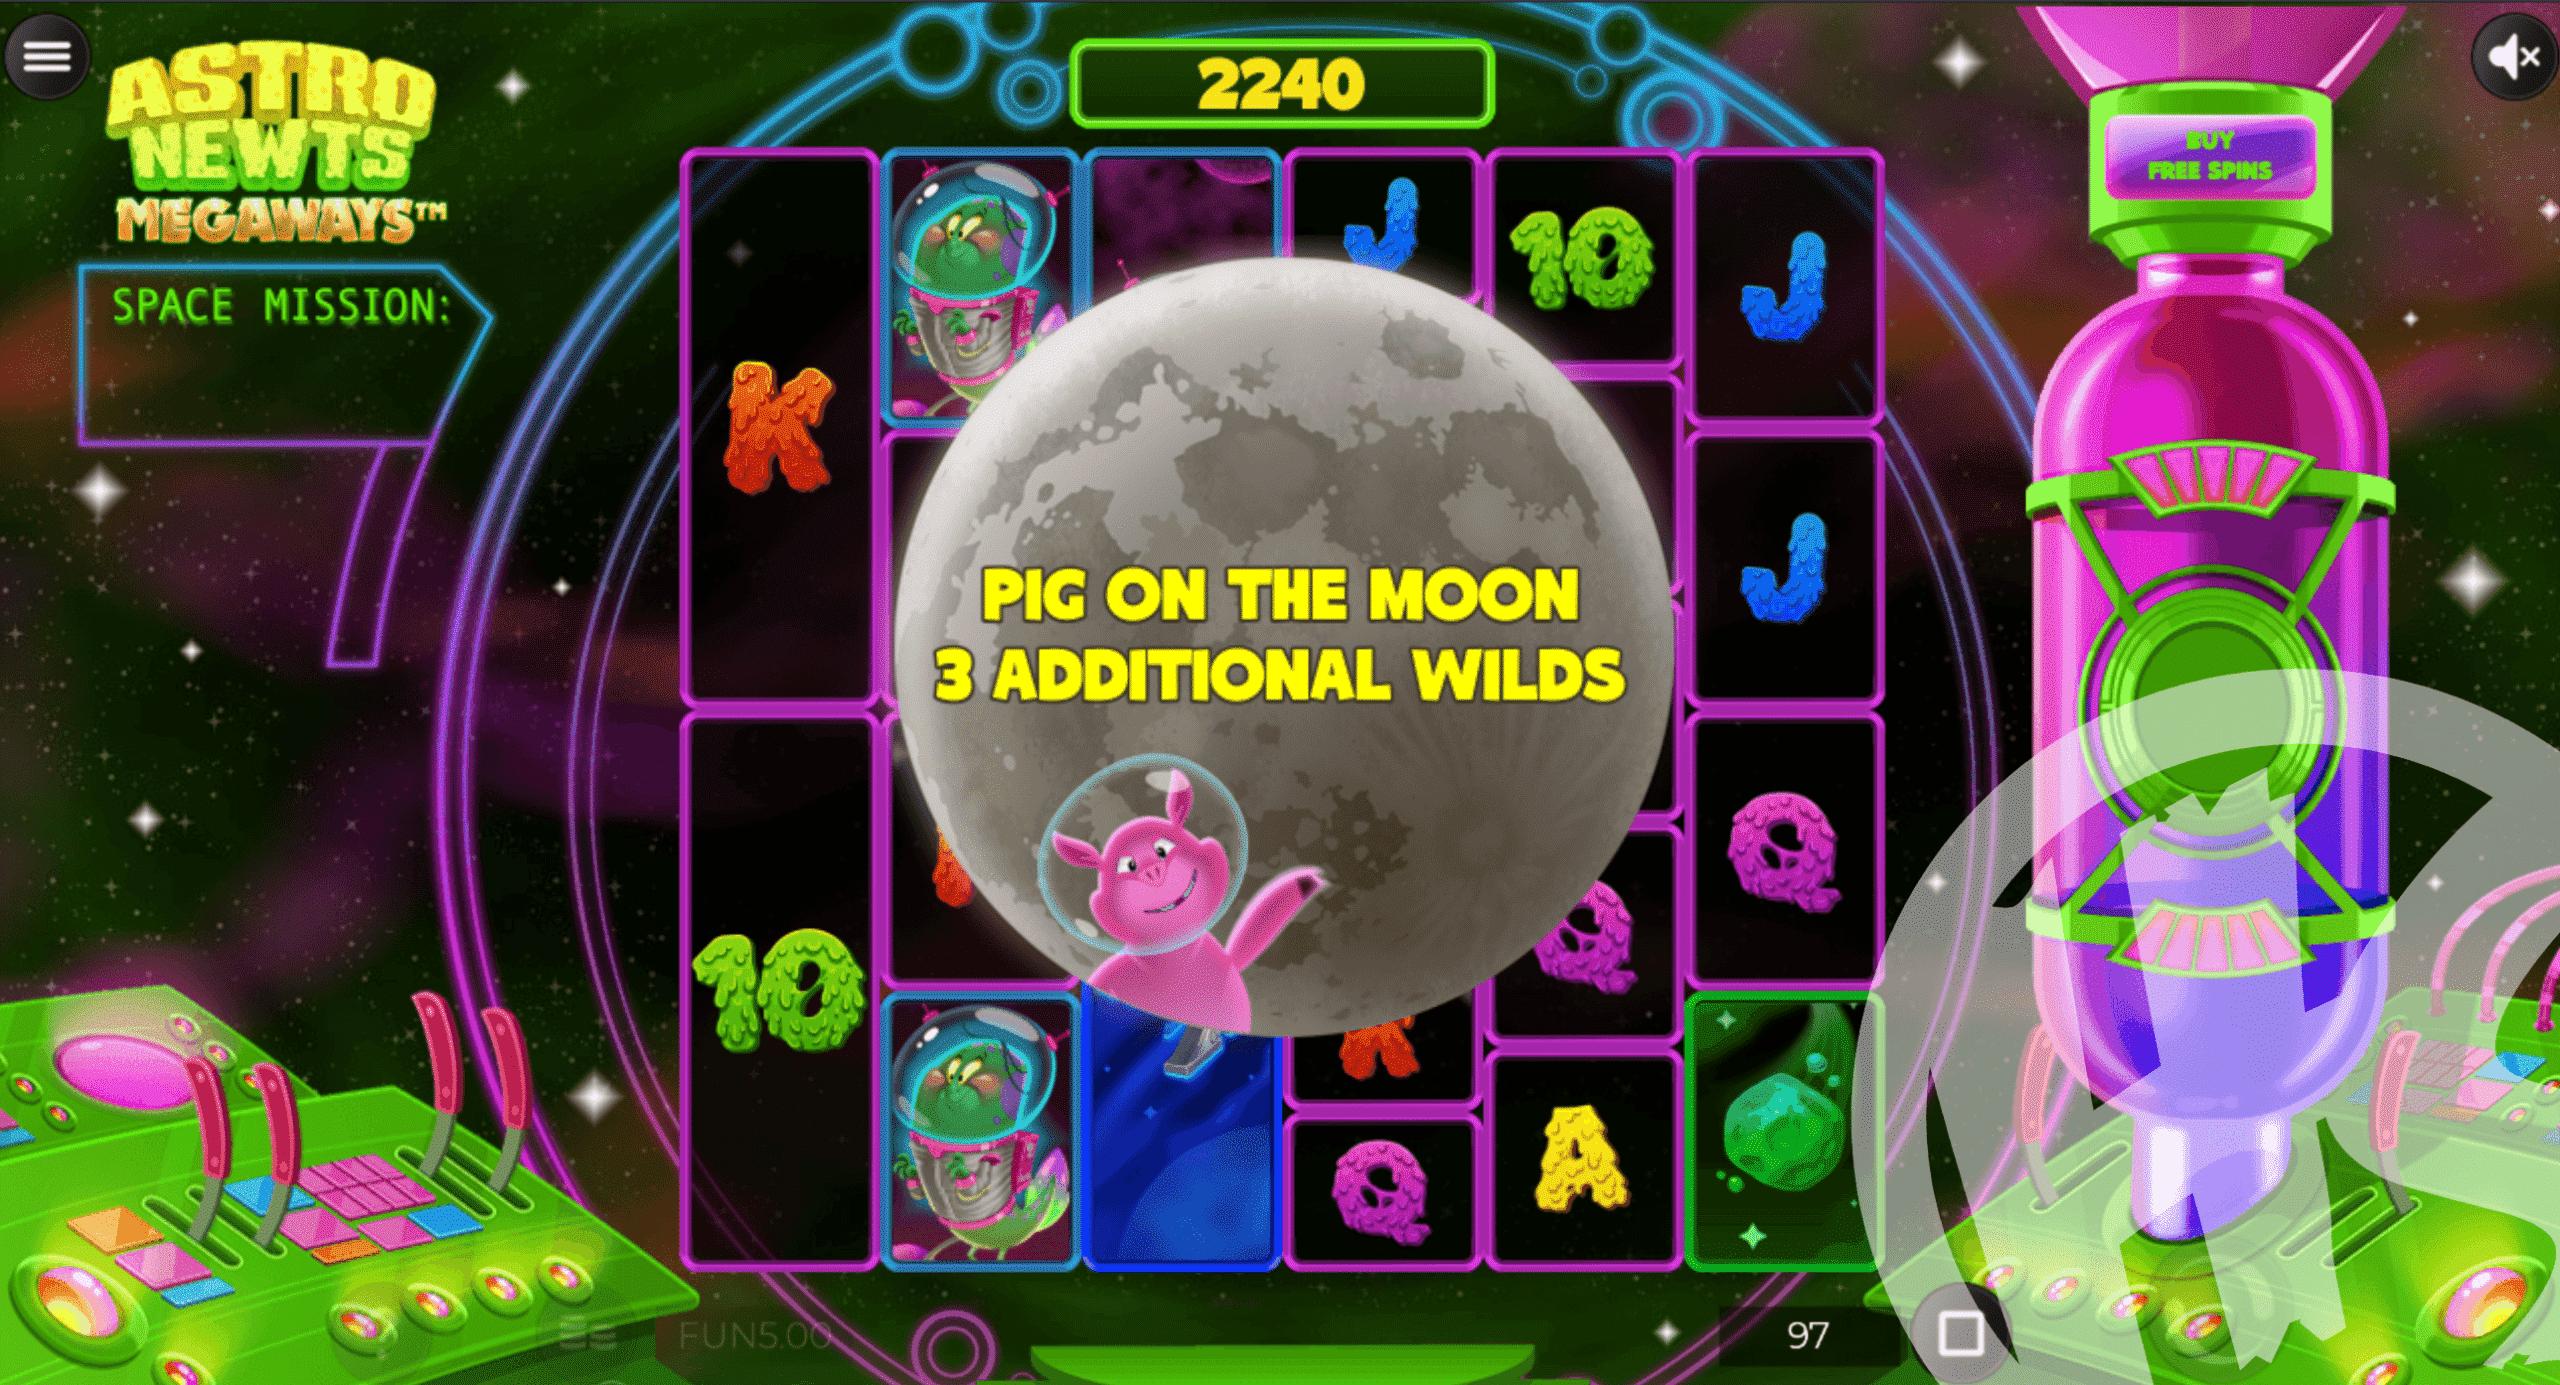 Astro Newts Megaways Pig on The Moon